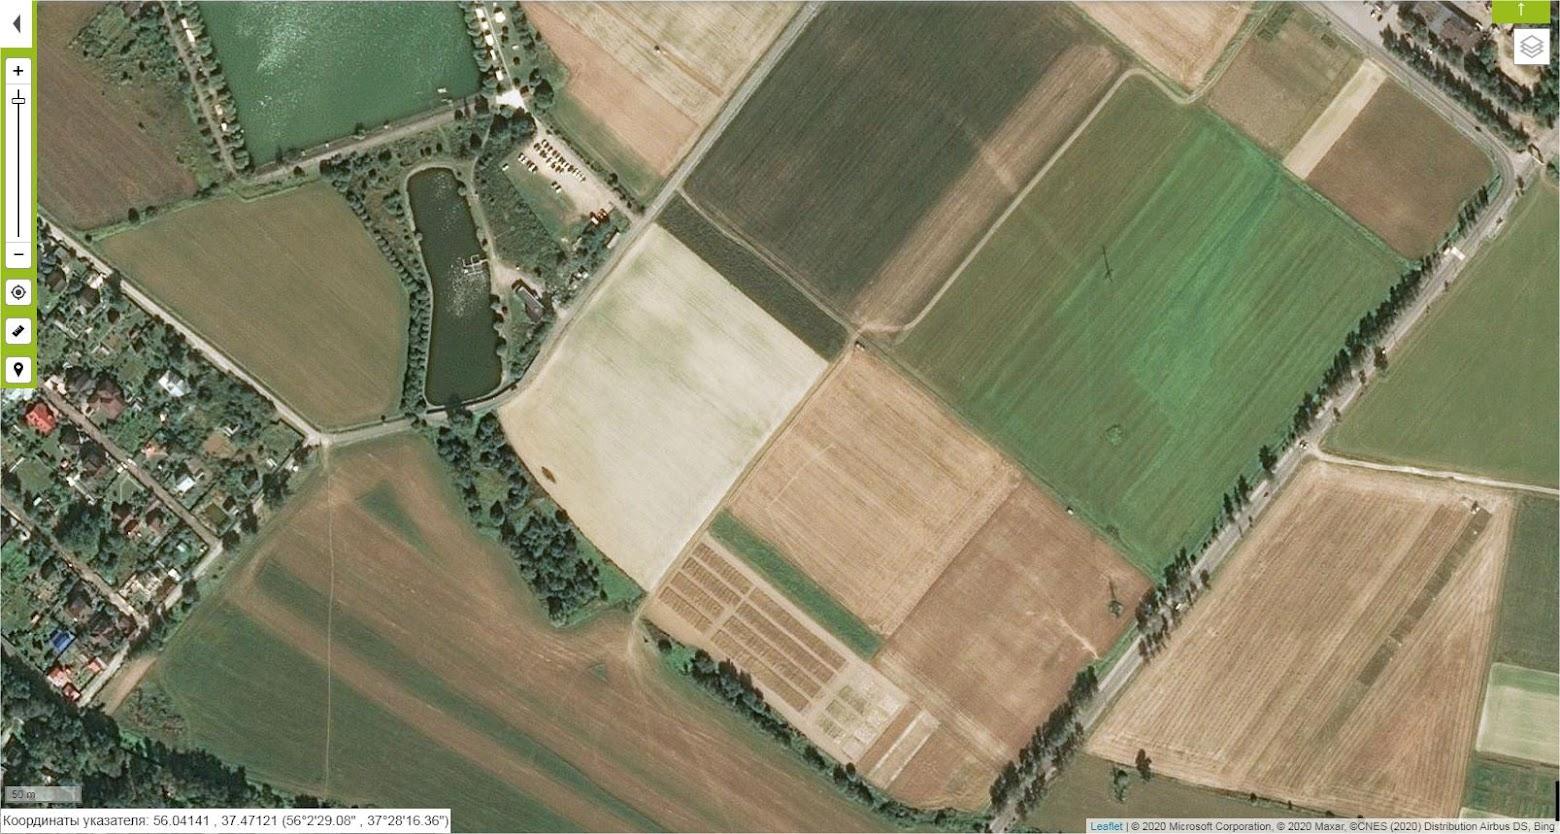 Карта-Раздериха-OSM_sm-снимки Bing - https://openstreetmap.ru/#map=17/56.04079/37.47067&layer=B